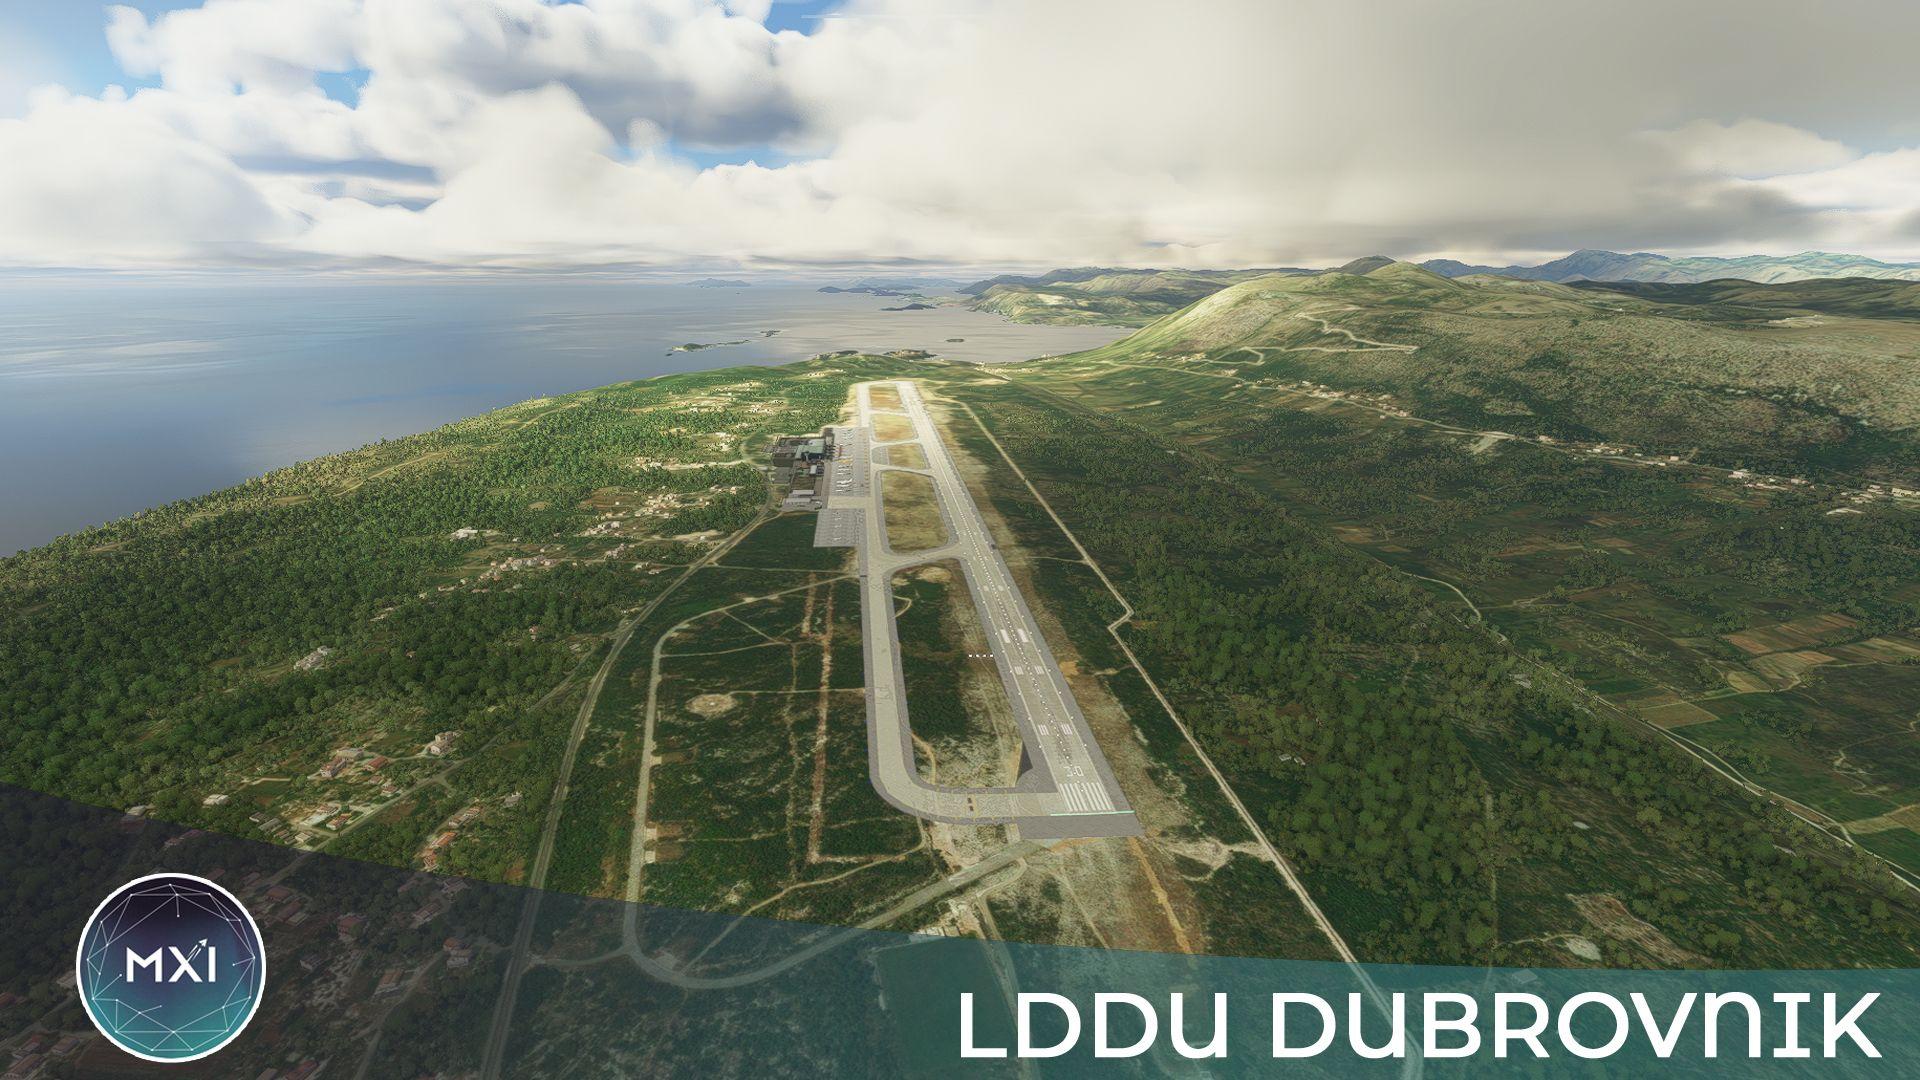 LDDU4.jpg